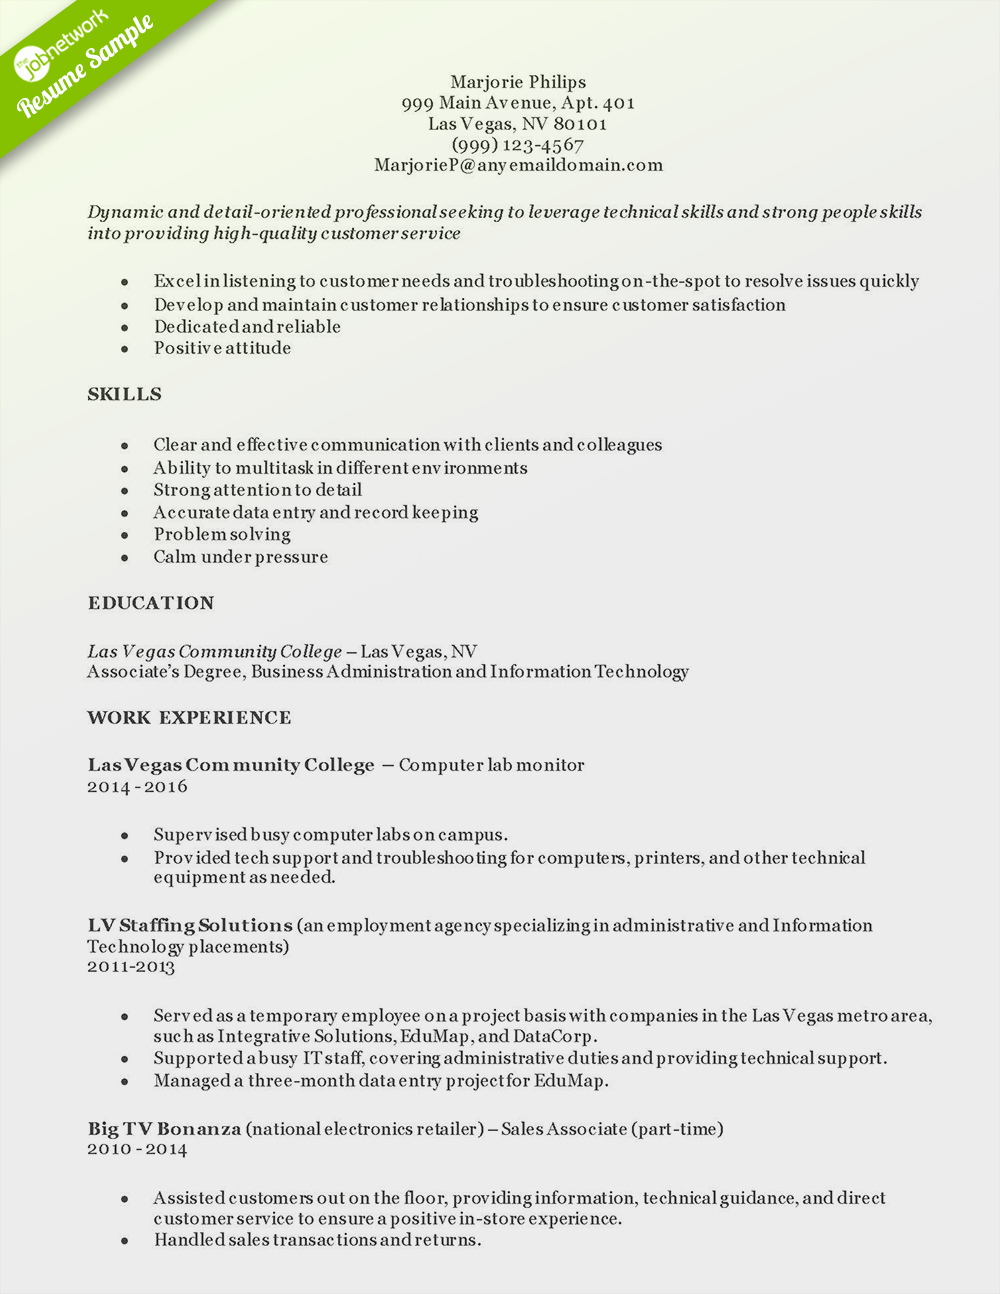 Entry Level Customer Service Resume Elegant How to Craft A Perfect Customer Service Resume Using Examples